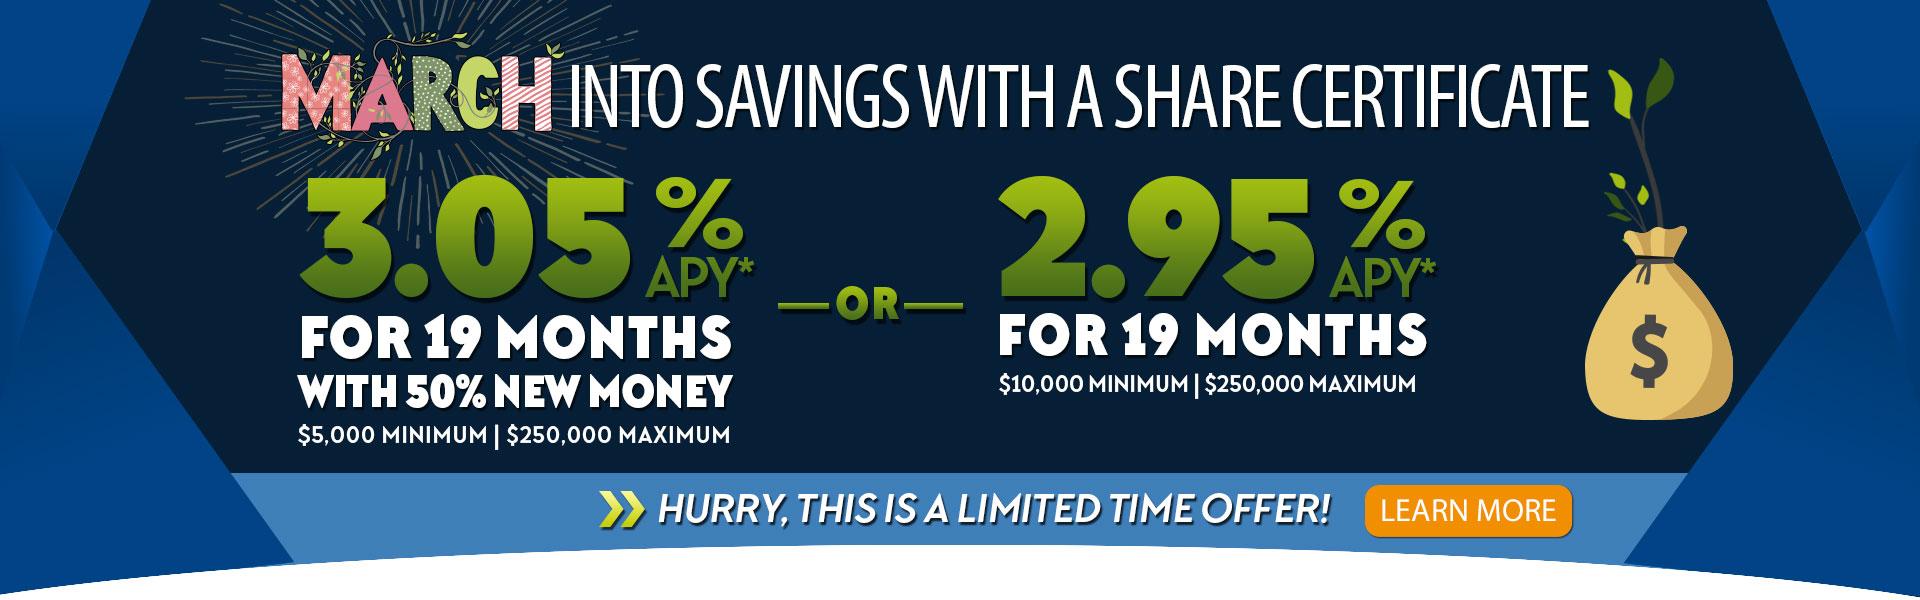 3.05% APY Share Cert